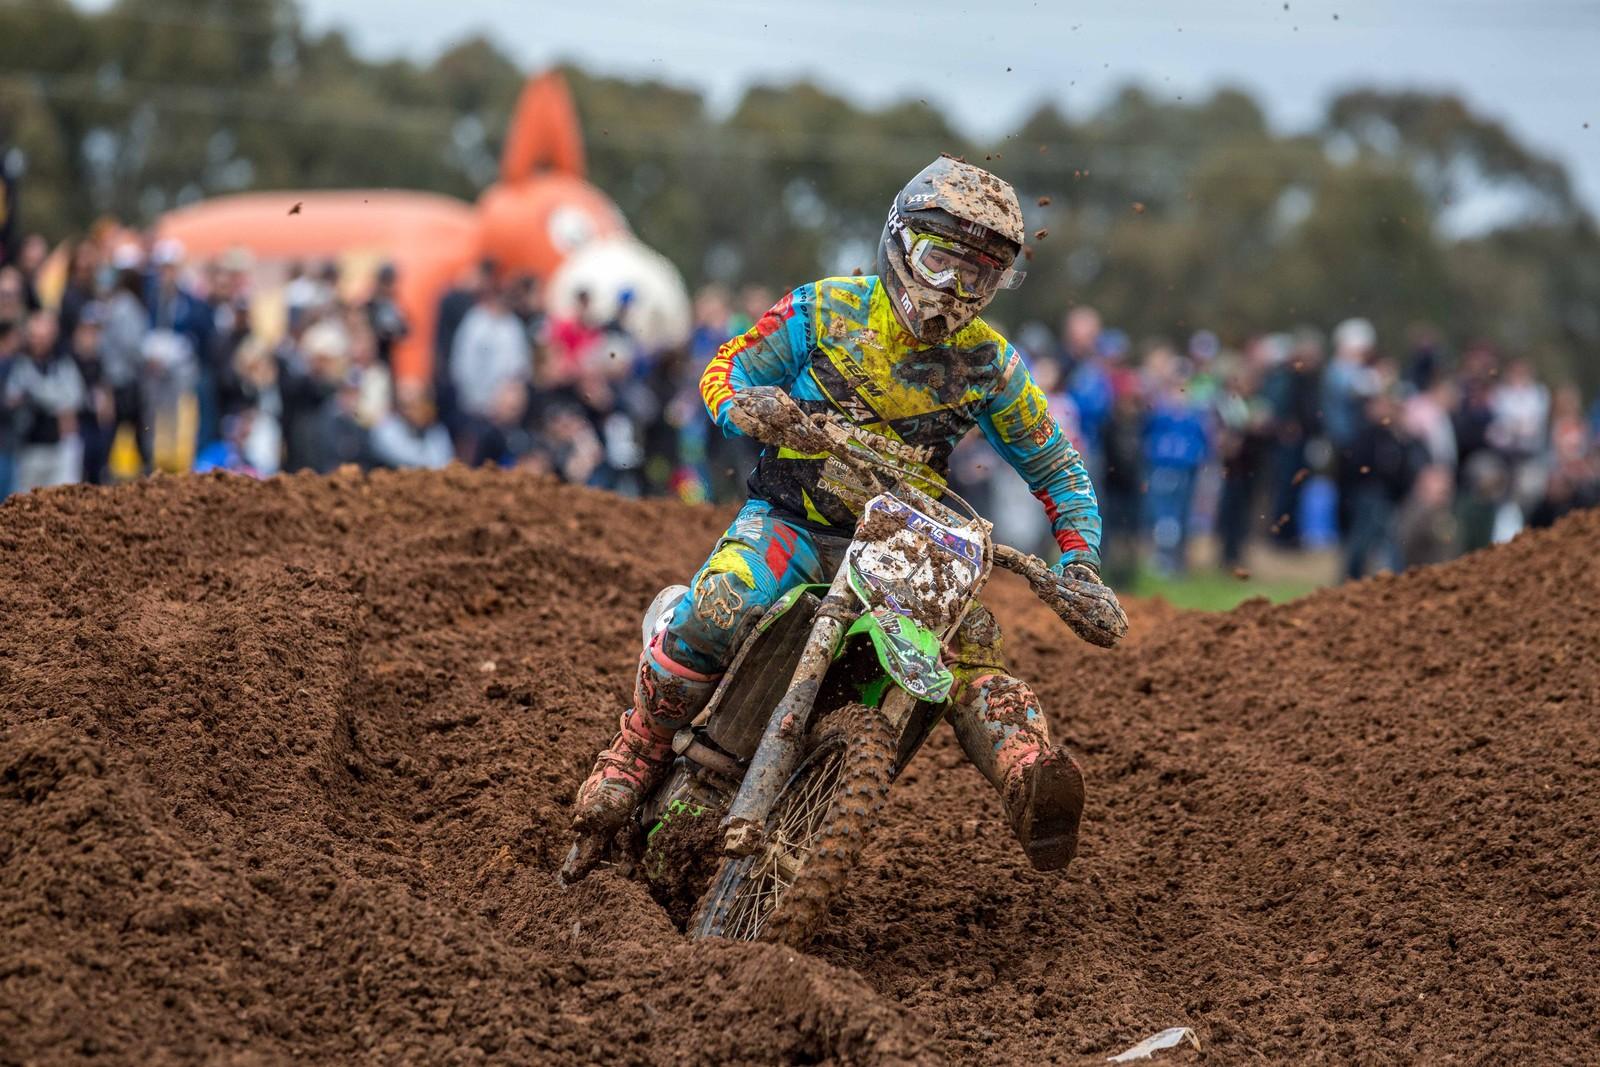 Meg Rutledge - Australian Motul MX Championships: Round 8, Shepparton - Motocross Pictures - Vital MX